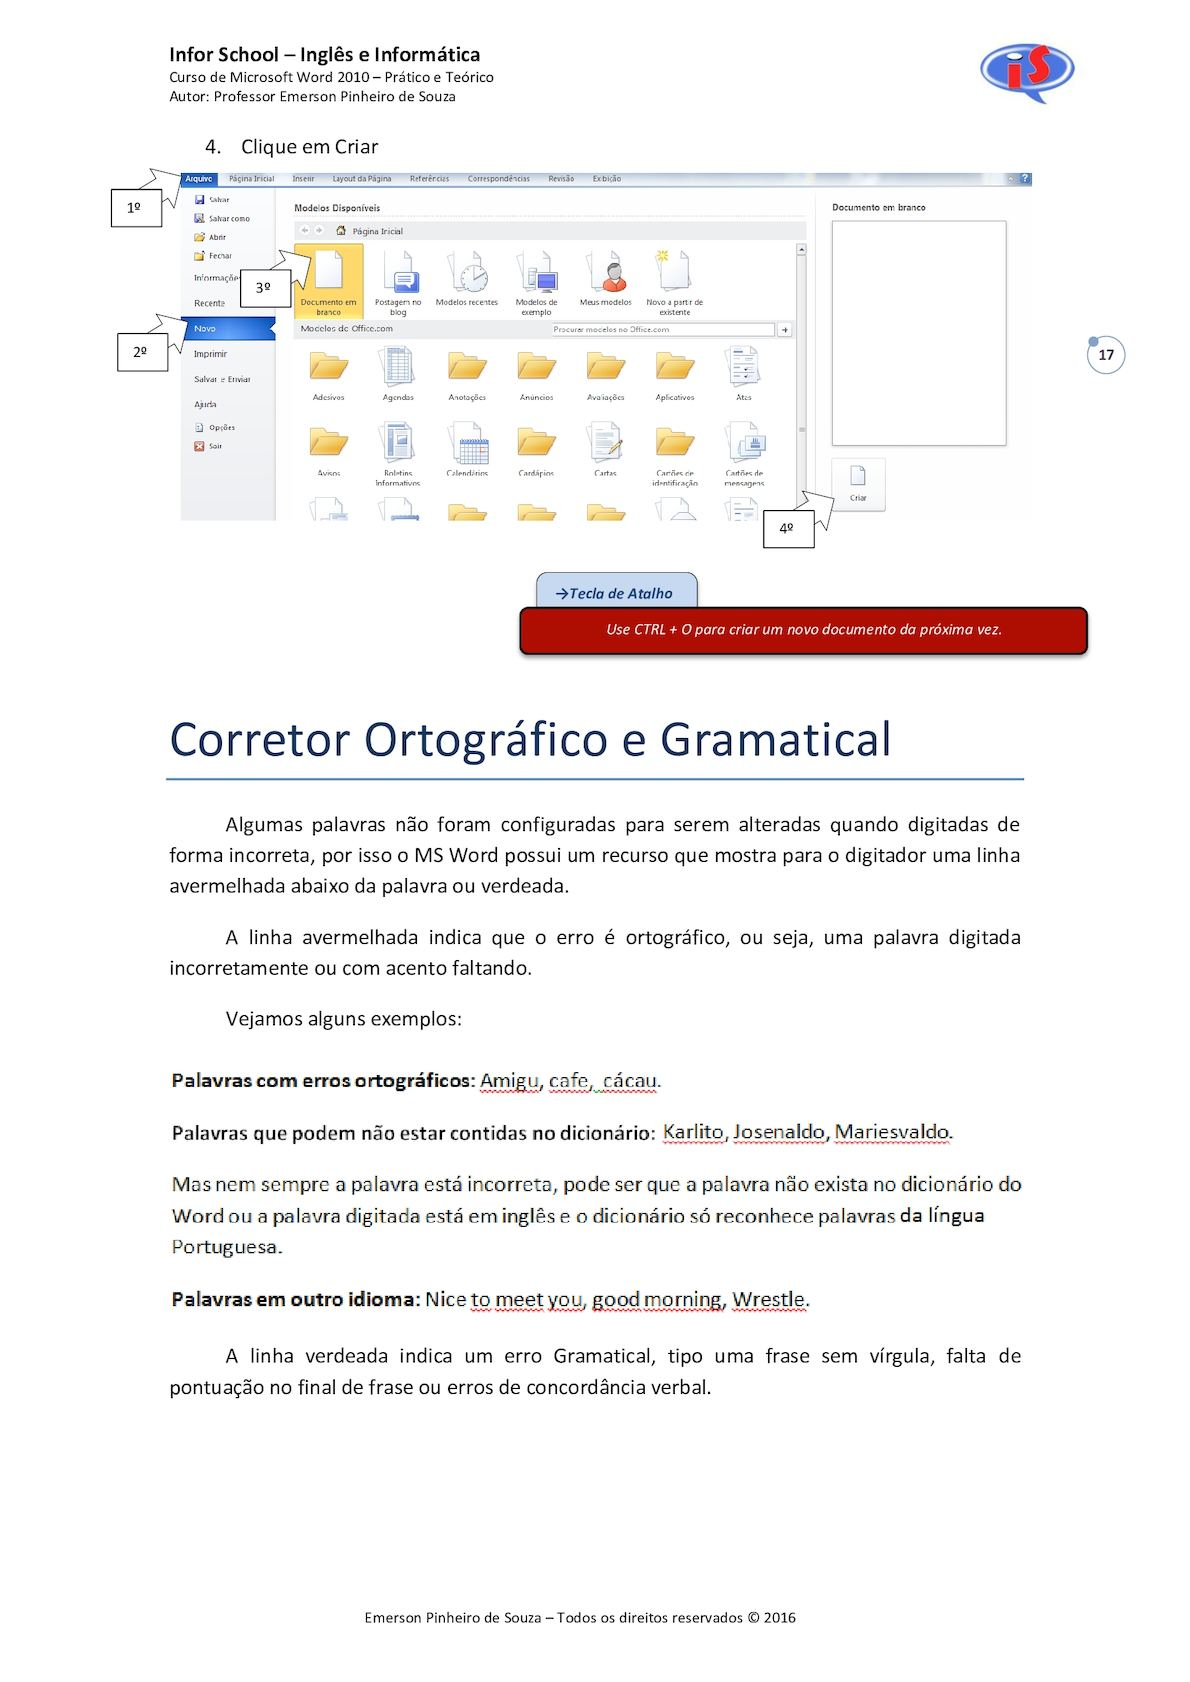 Apostila De Microsoft Word 2010 2 Calameo Downloader